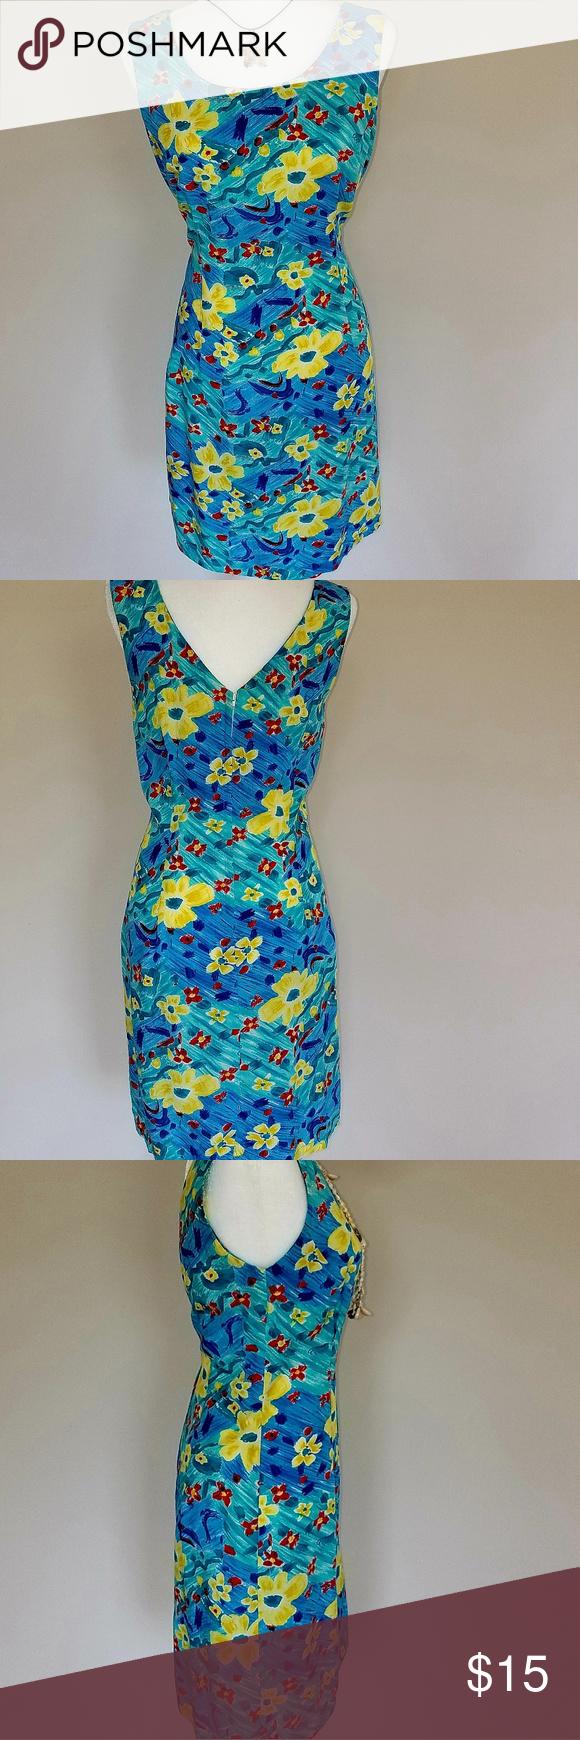 90s Xtreme Island Designs Vintage Shift Dress Vintage Shift Dress Shift Dress Dresses [ 1740 x 580 Pixel ]